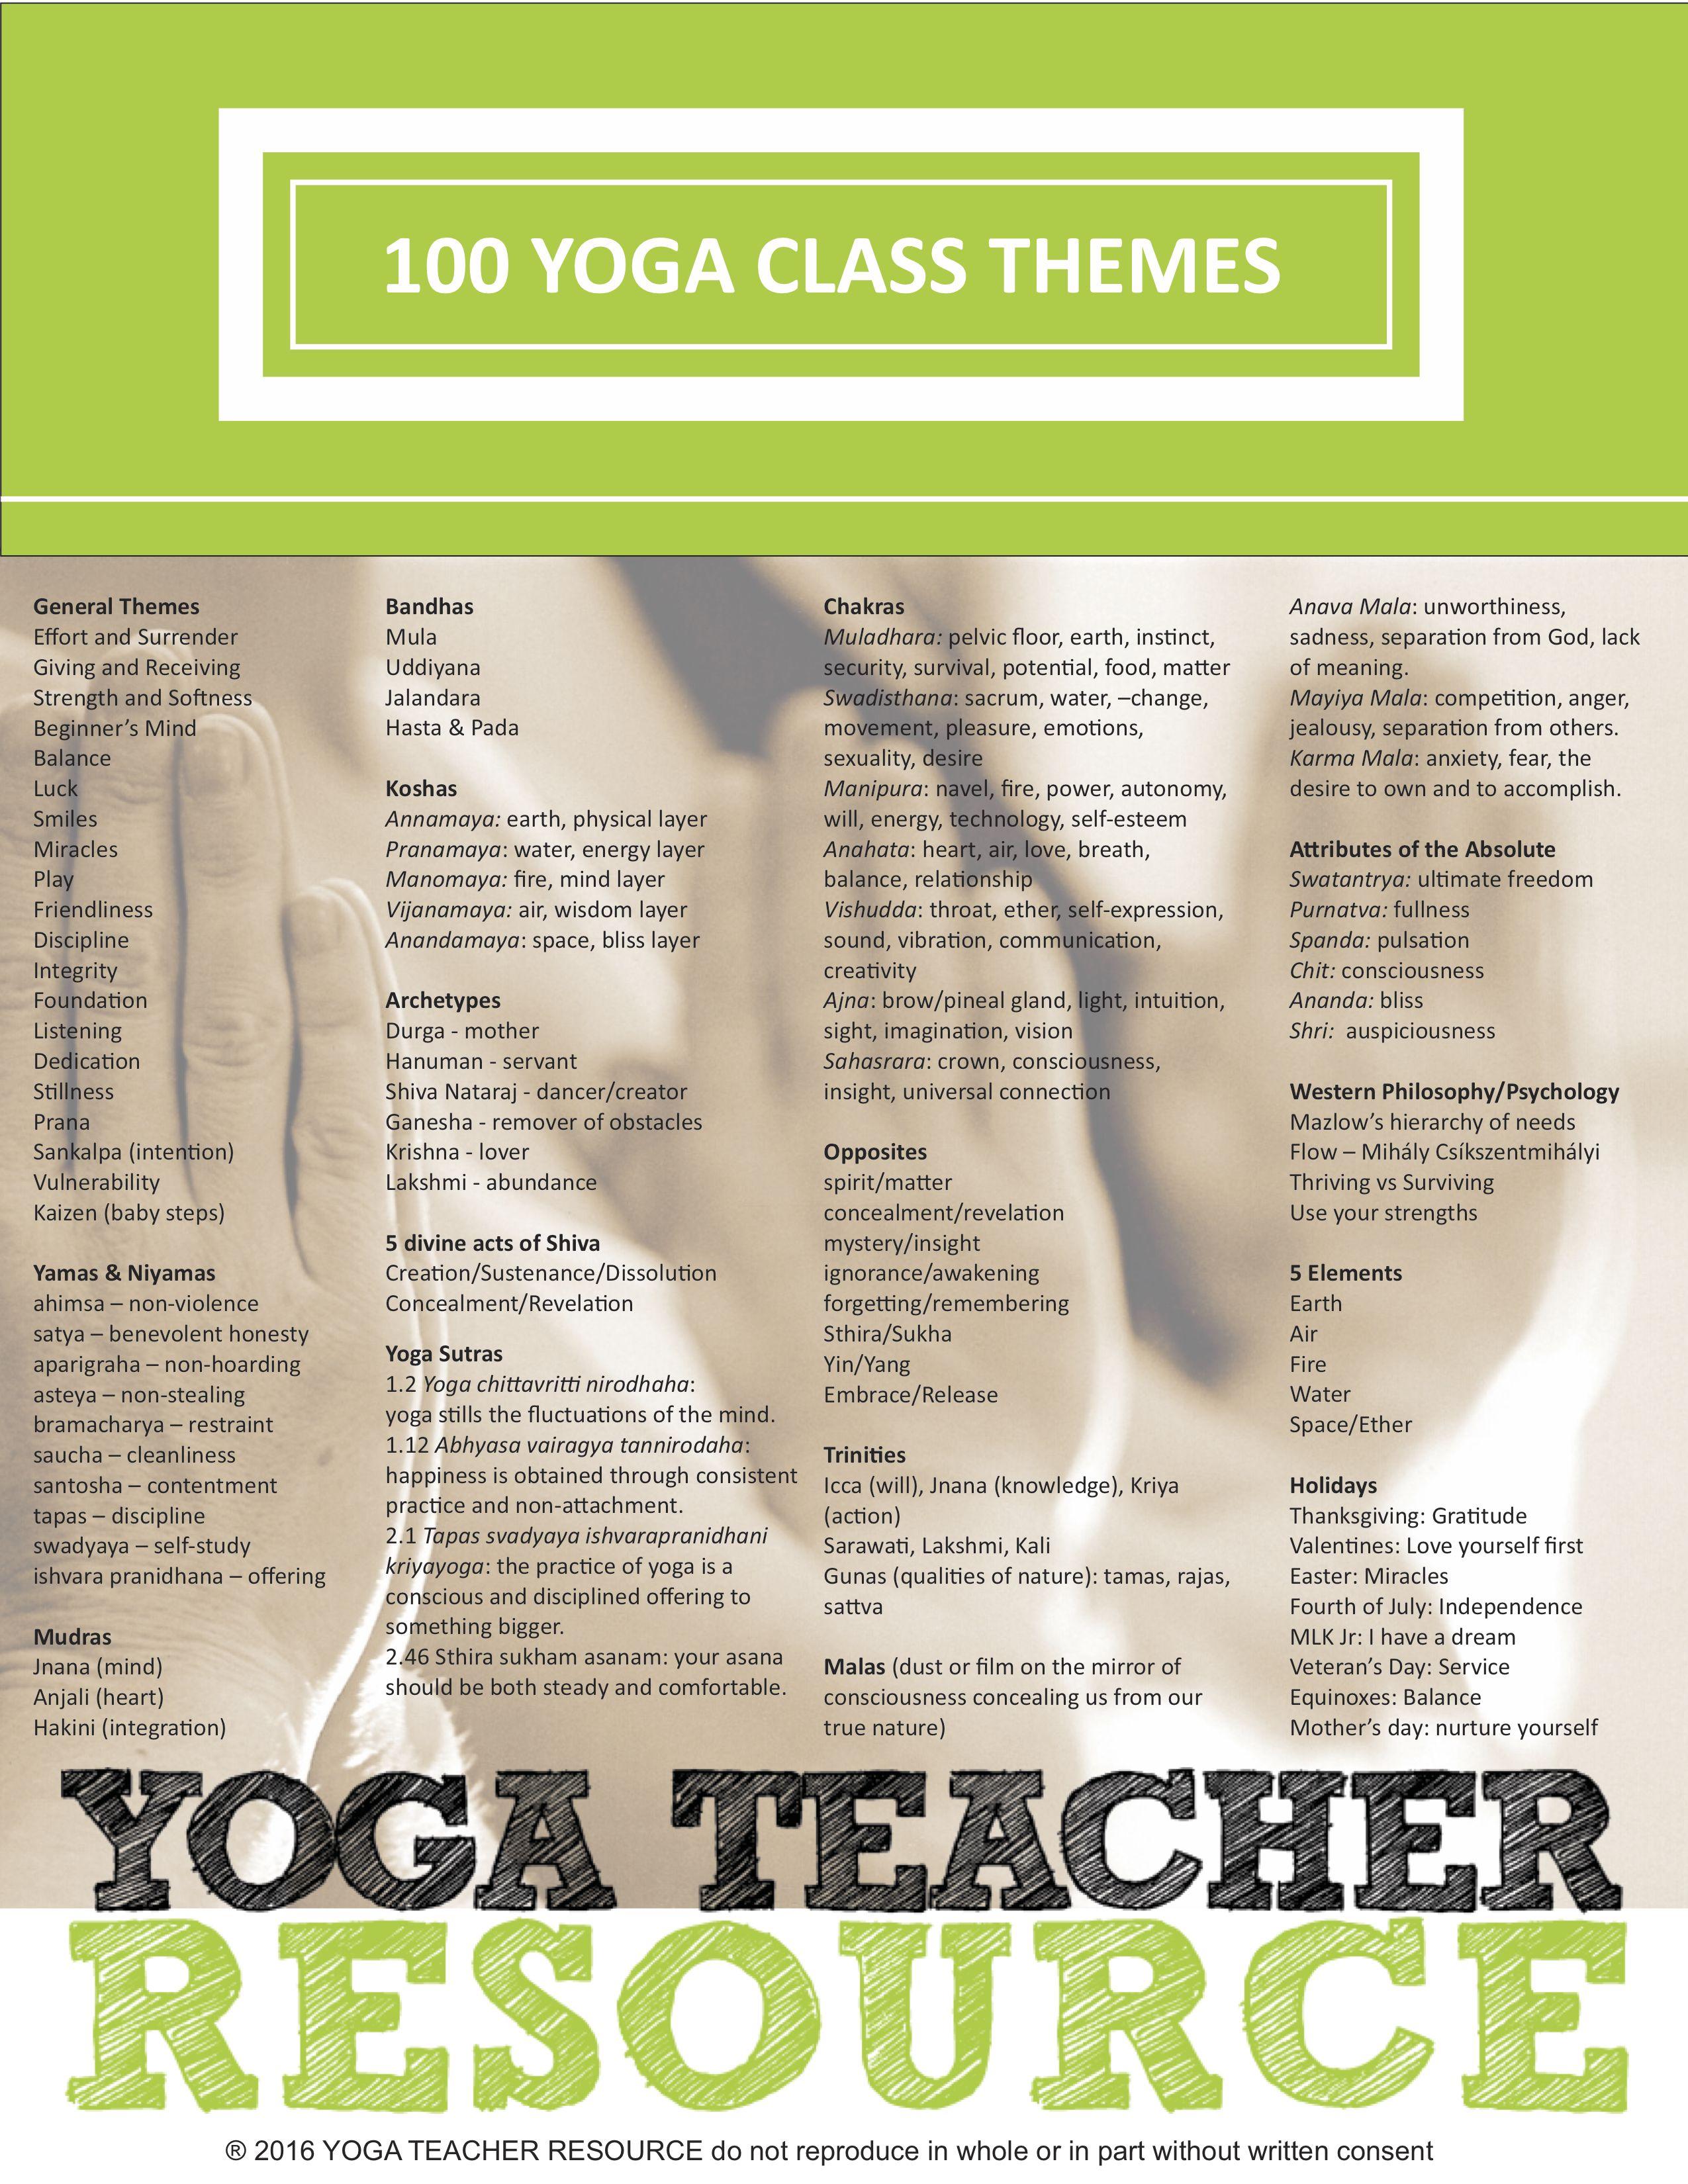 100 Yoga Class Themes Yoga Yoga Yoga Poses Lesson Plans